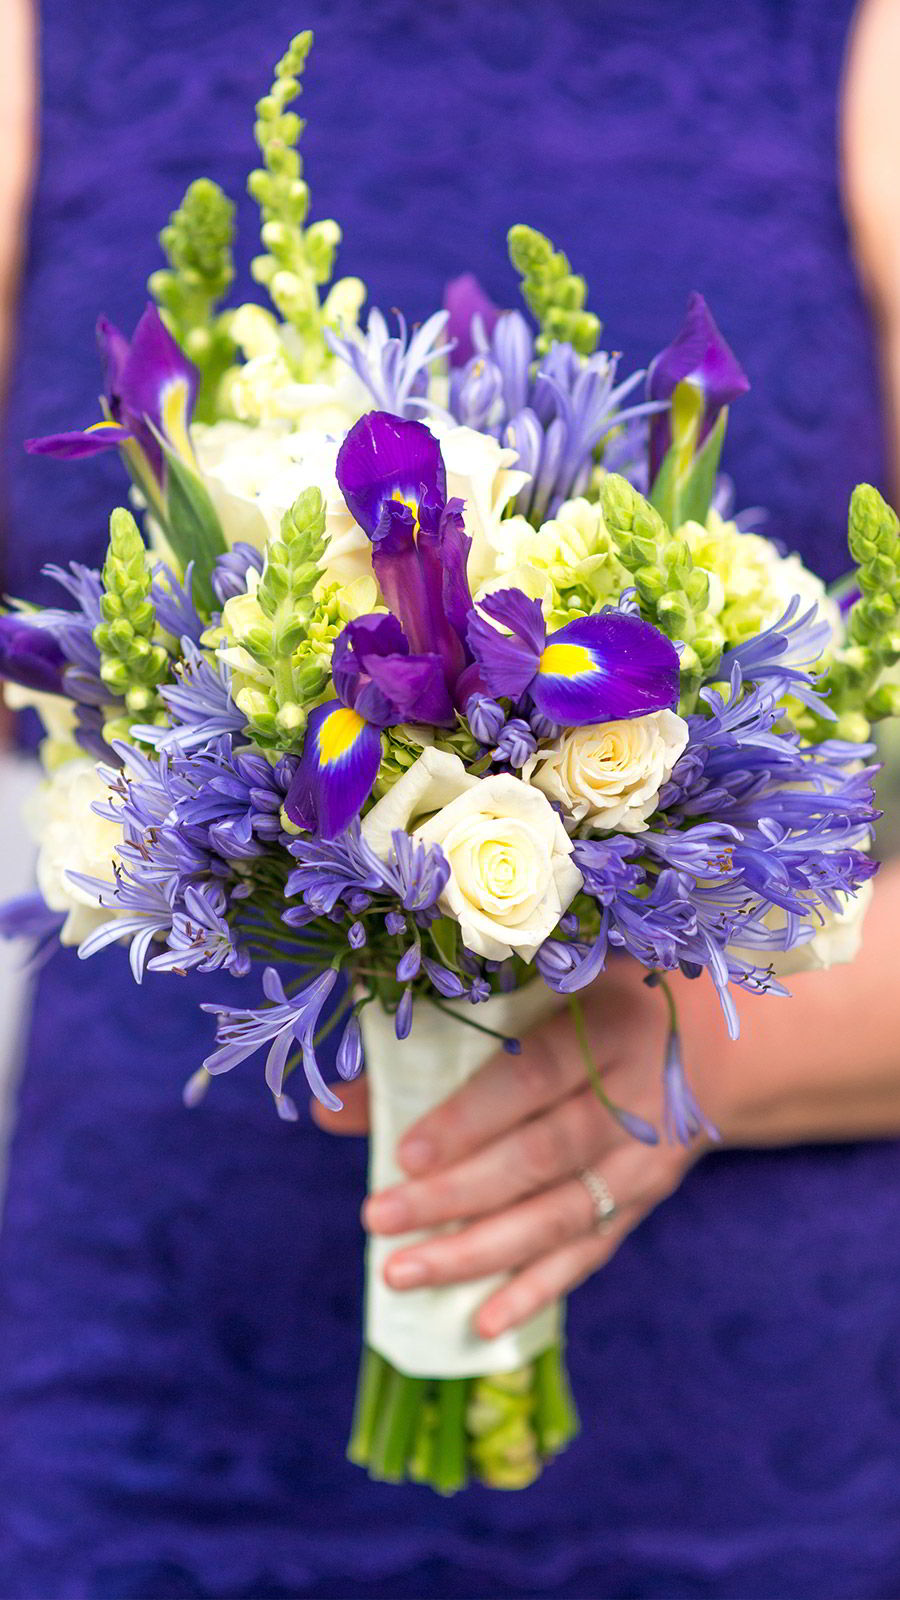 marriott el mangroove guanacaste costa rica honeymoon destination wedding venue purple bouquet wedding theme